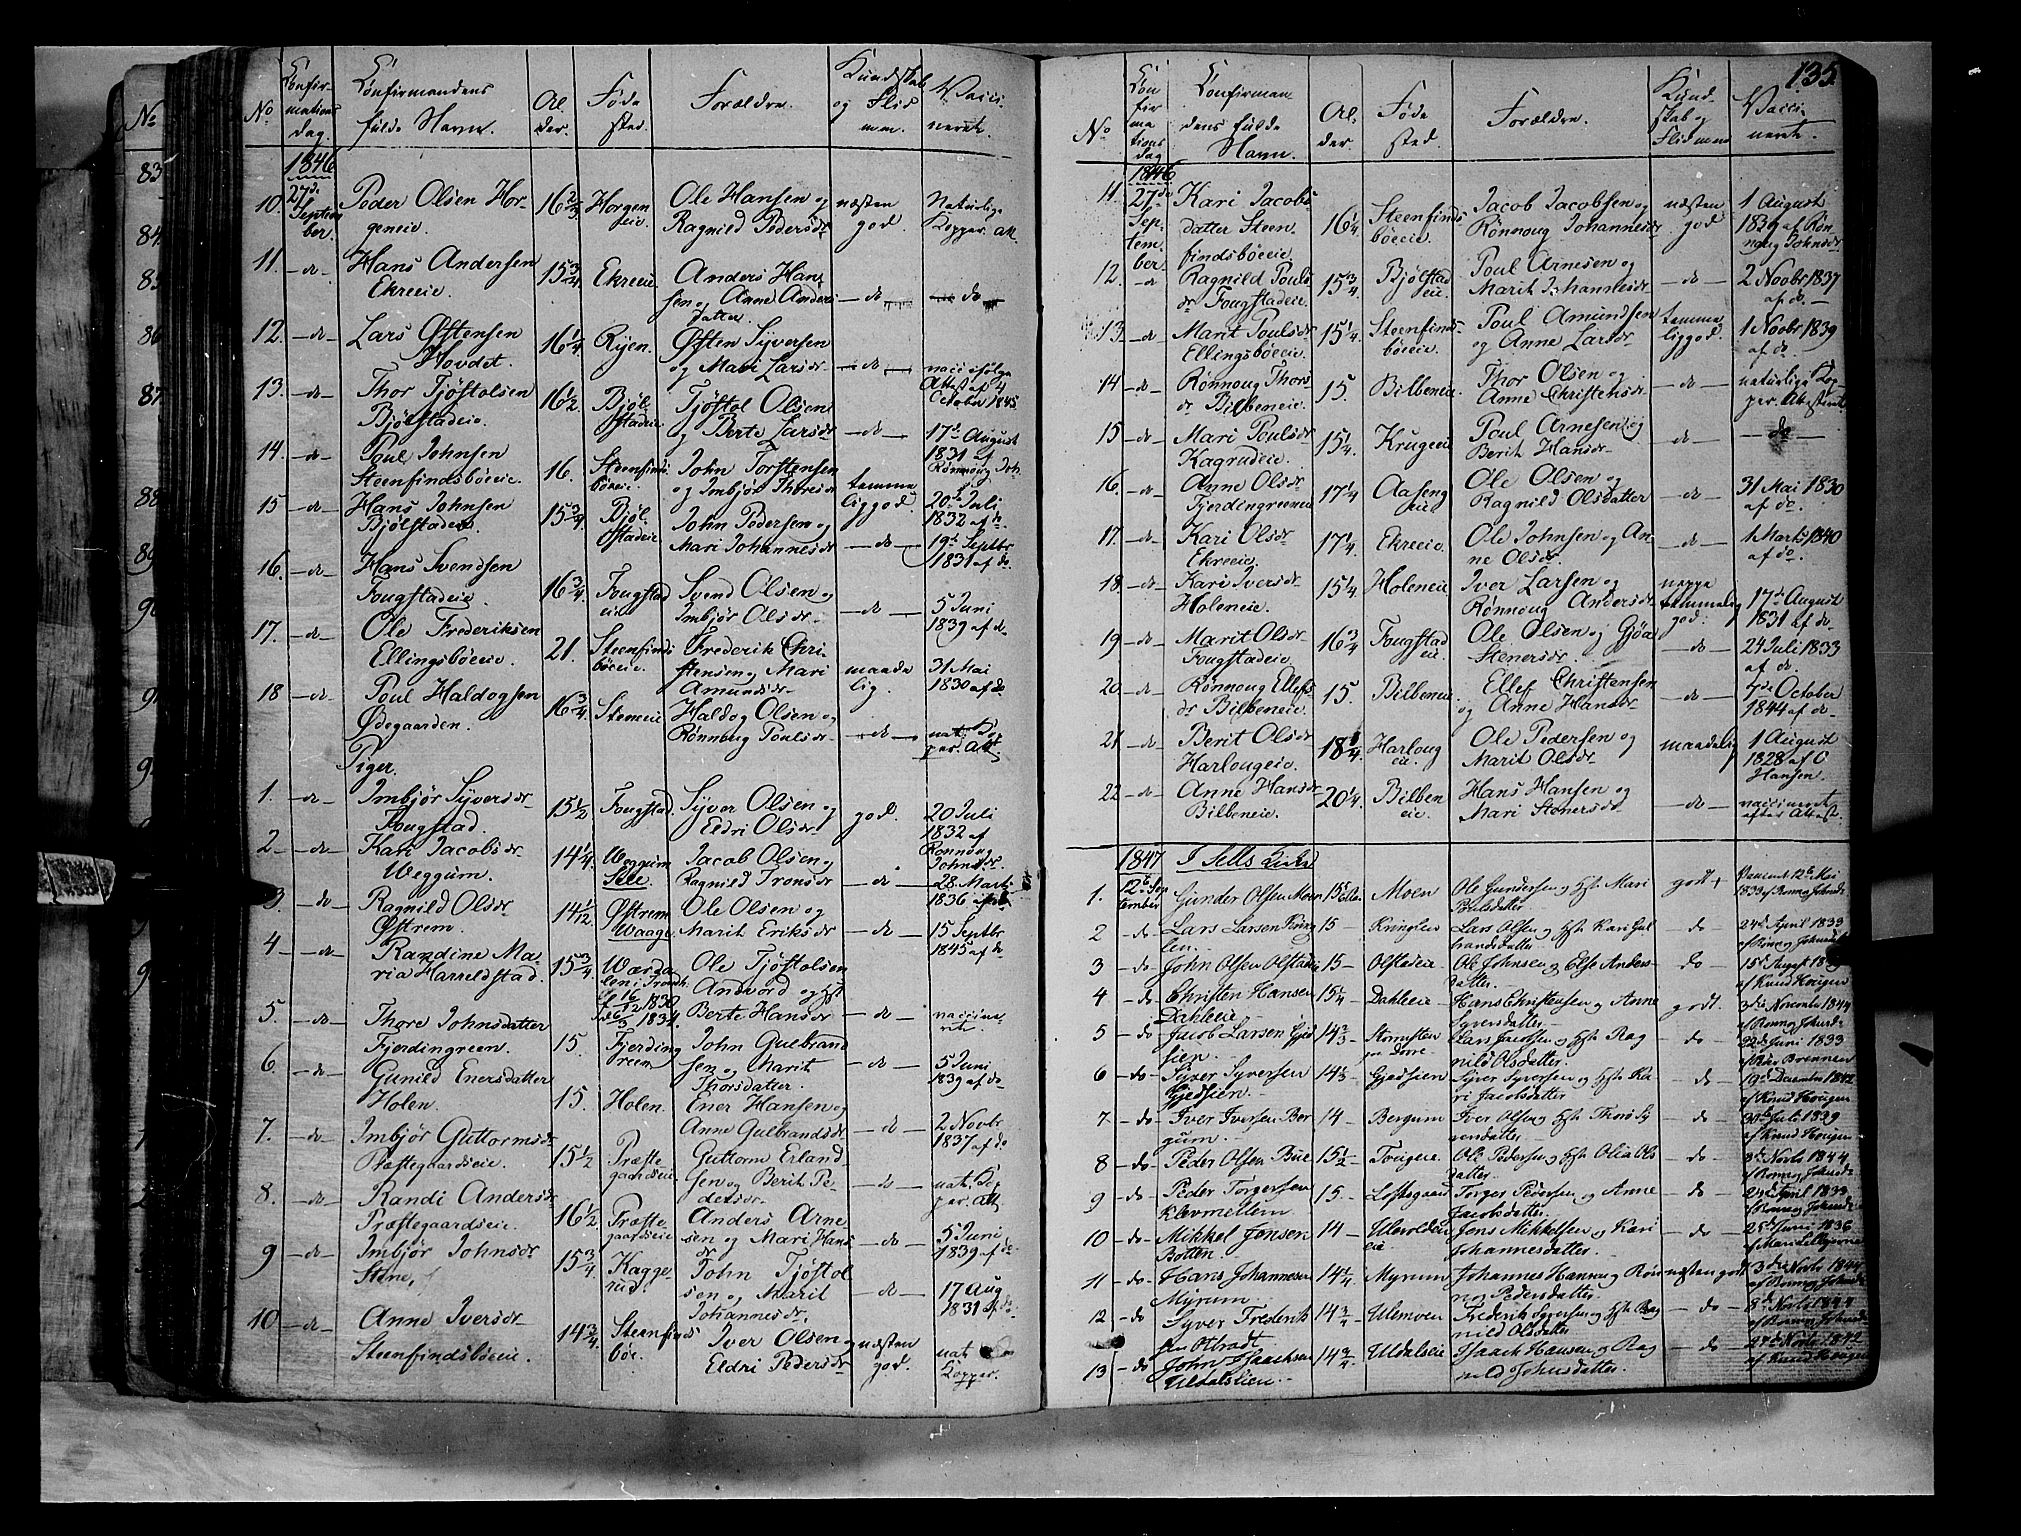 SAH, Vågå prestekontor, Ministerialbok nr. 5 /1, 1842-1856, s. 135